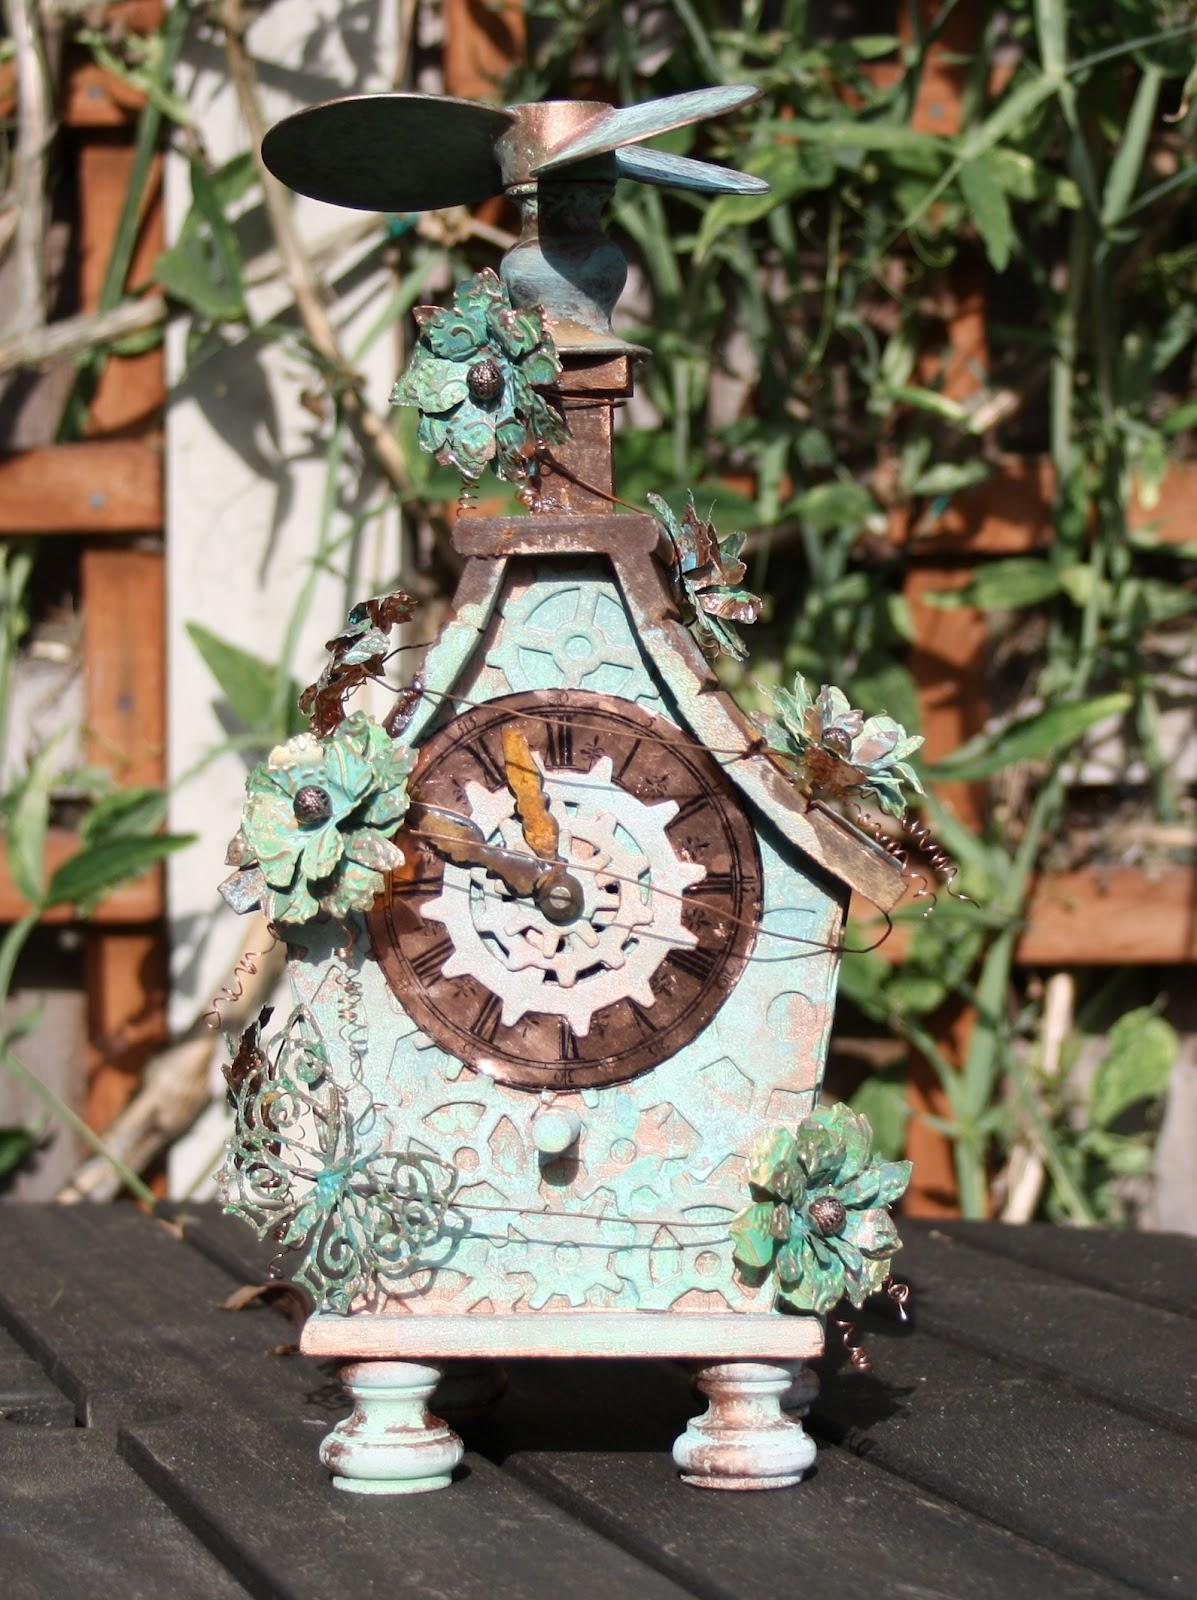 Carol Fox Welcome 2 My World Steampunk Birdhouse